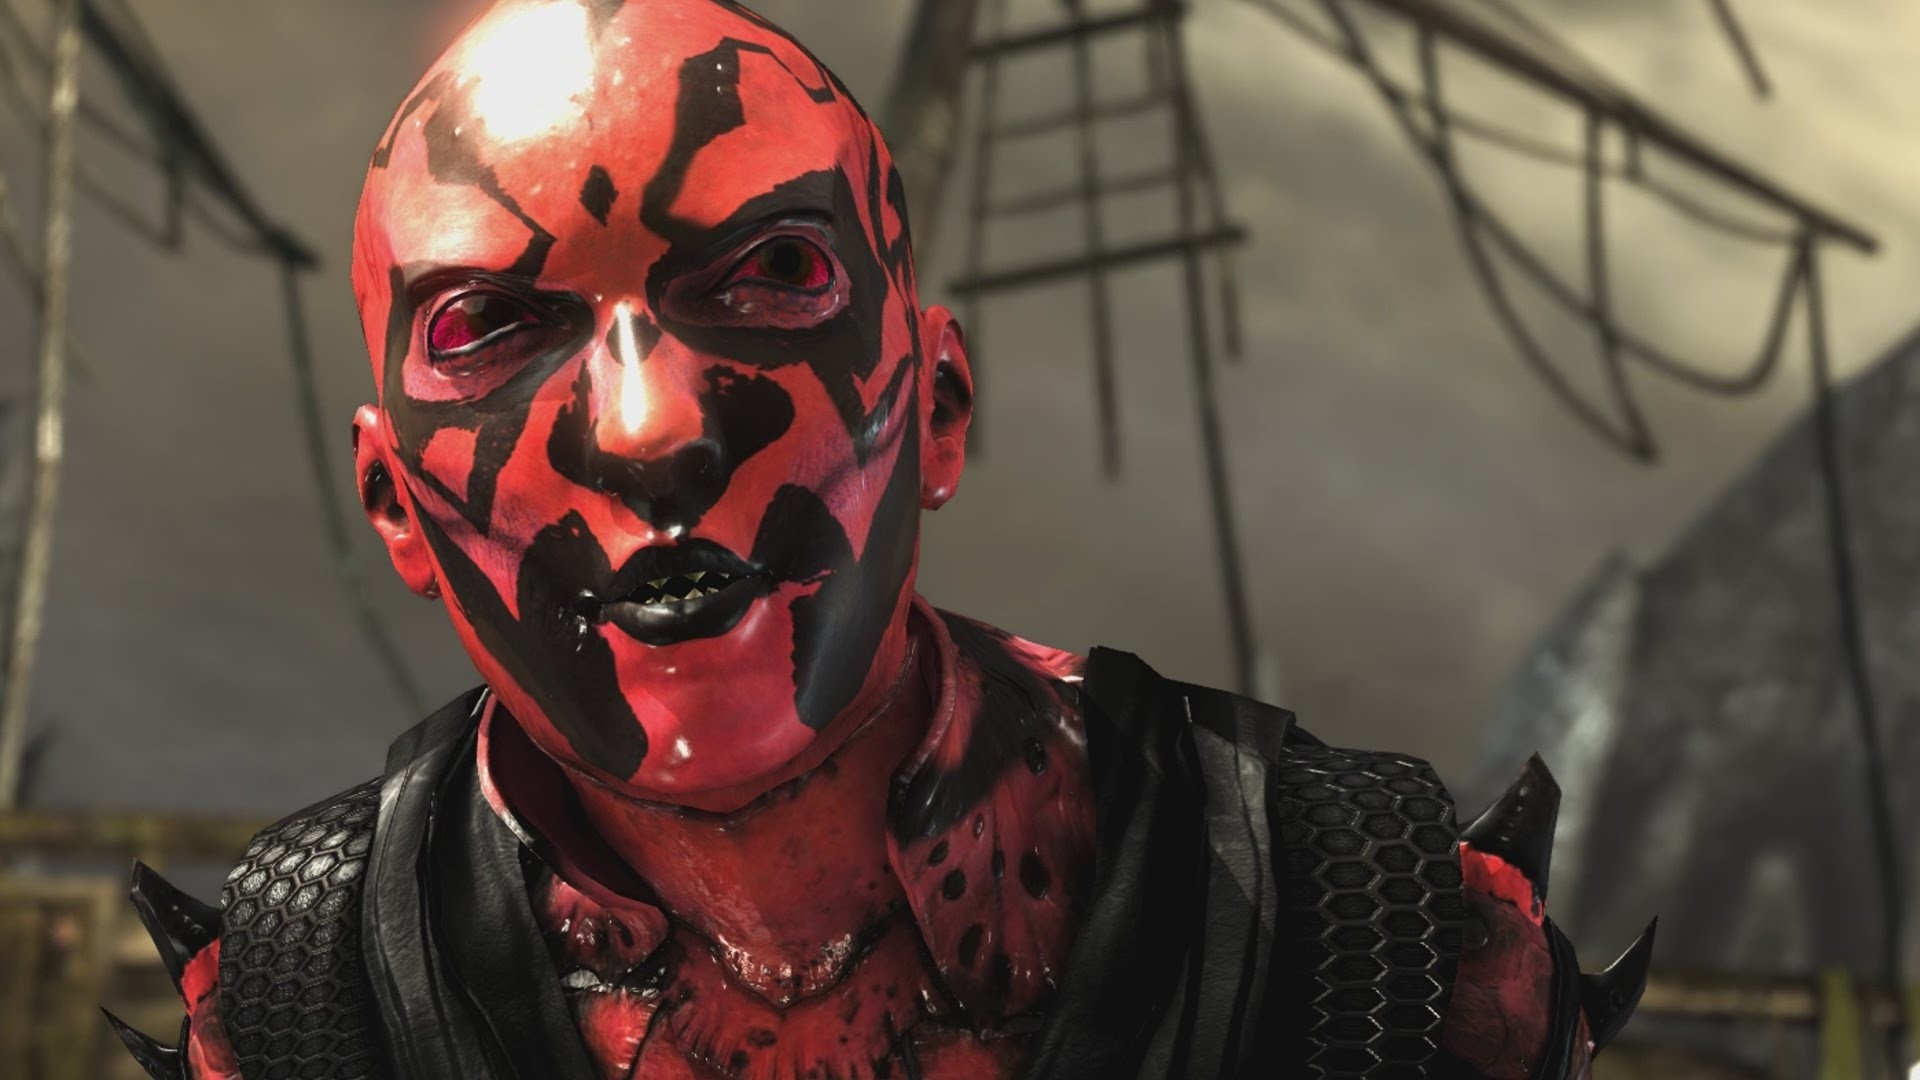 Mortal Kombat X – D'Vorah Darth Maul Costume / Skin PC Mod (1080p 60FPS) –  YouTube